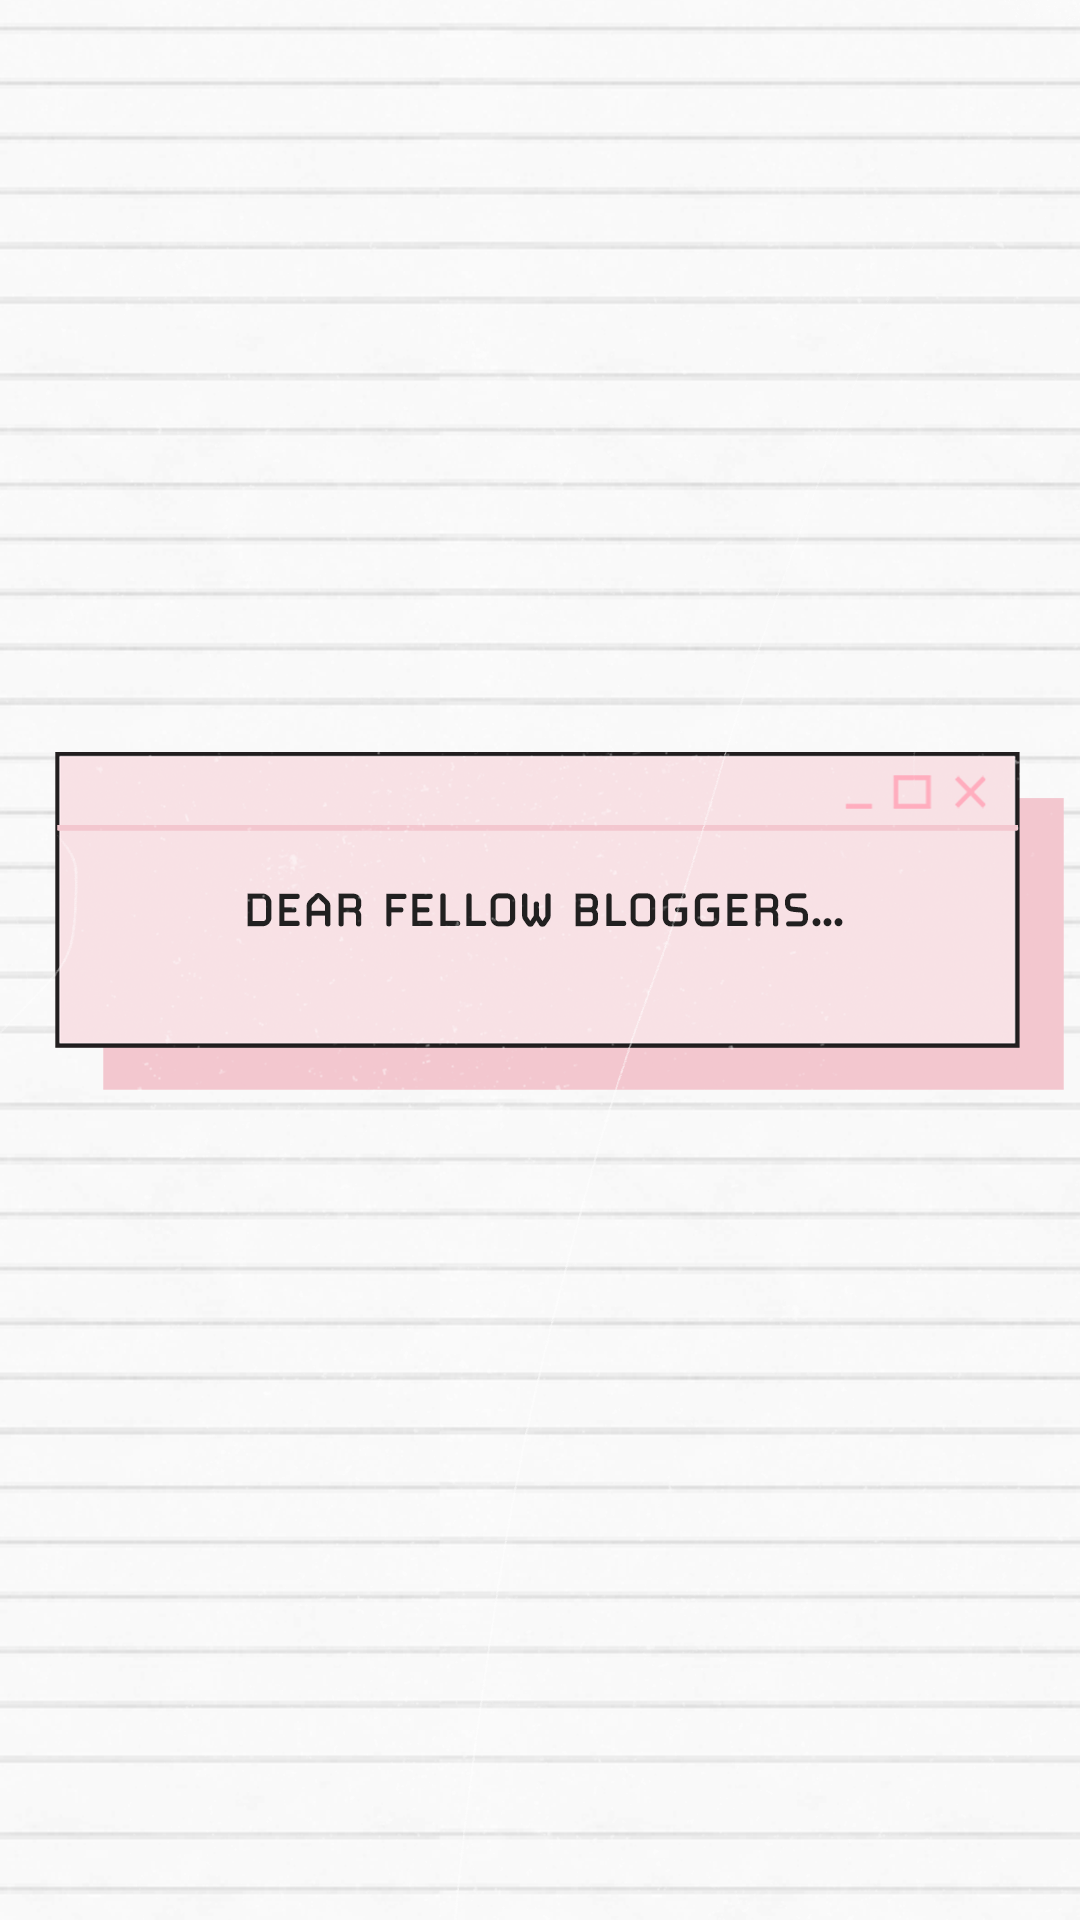 dear fellow bloggers